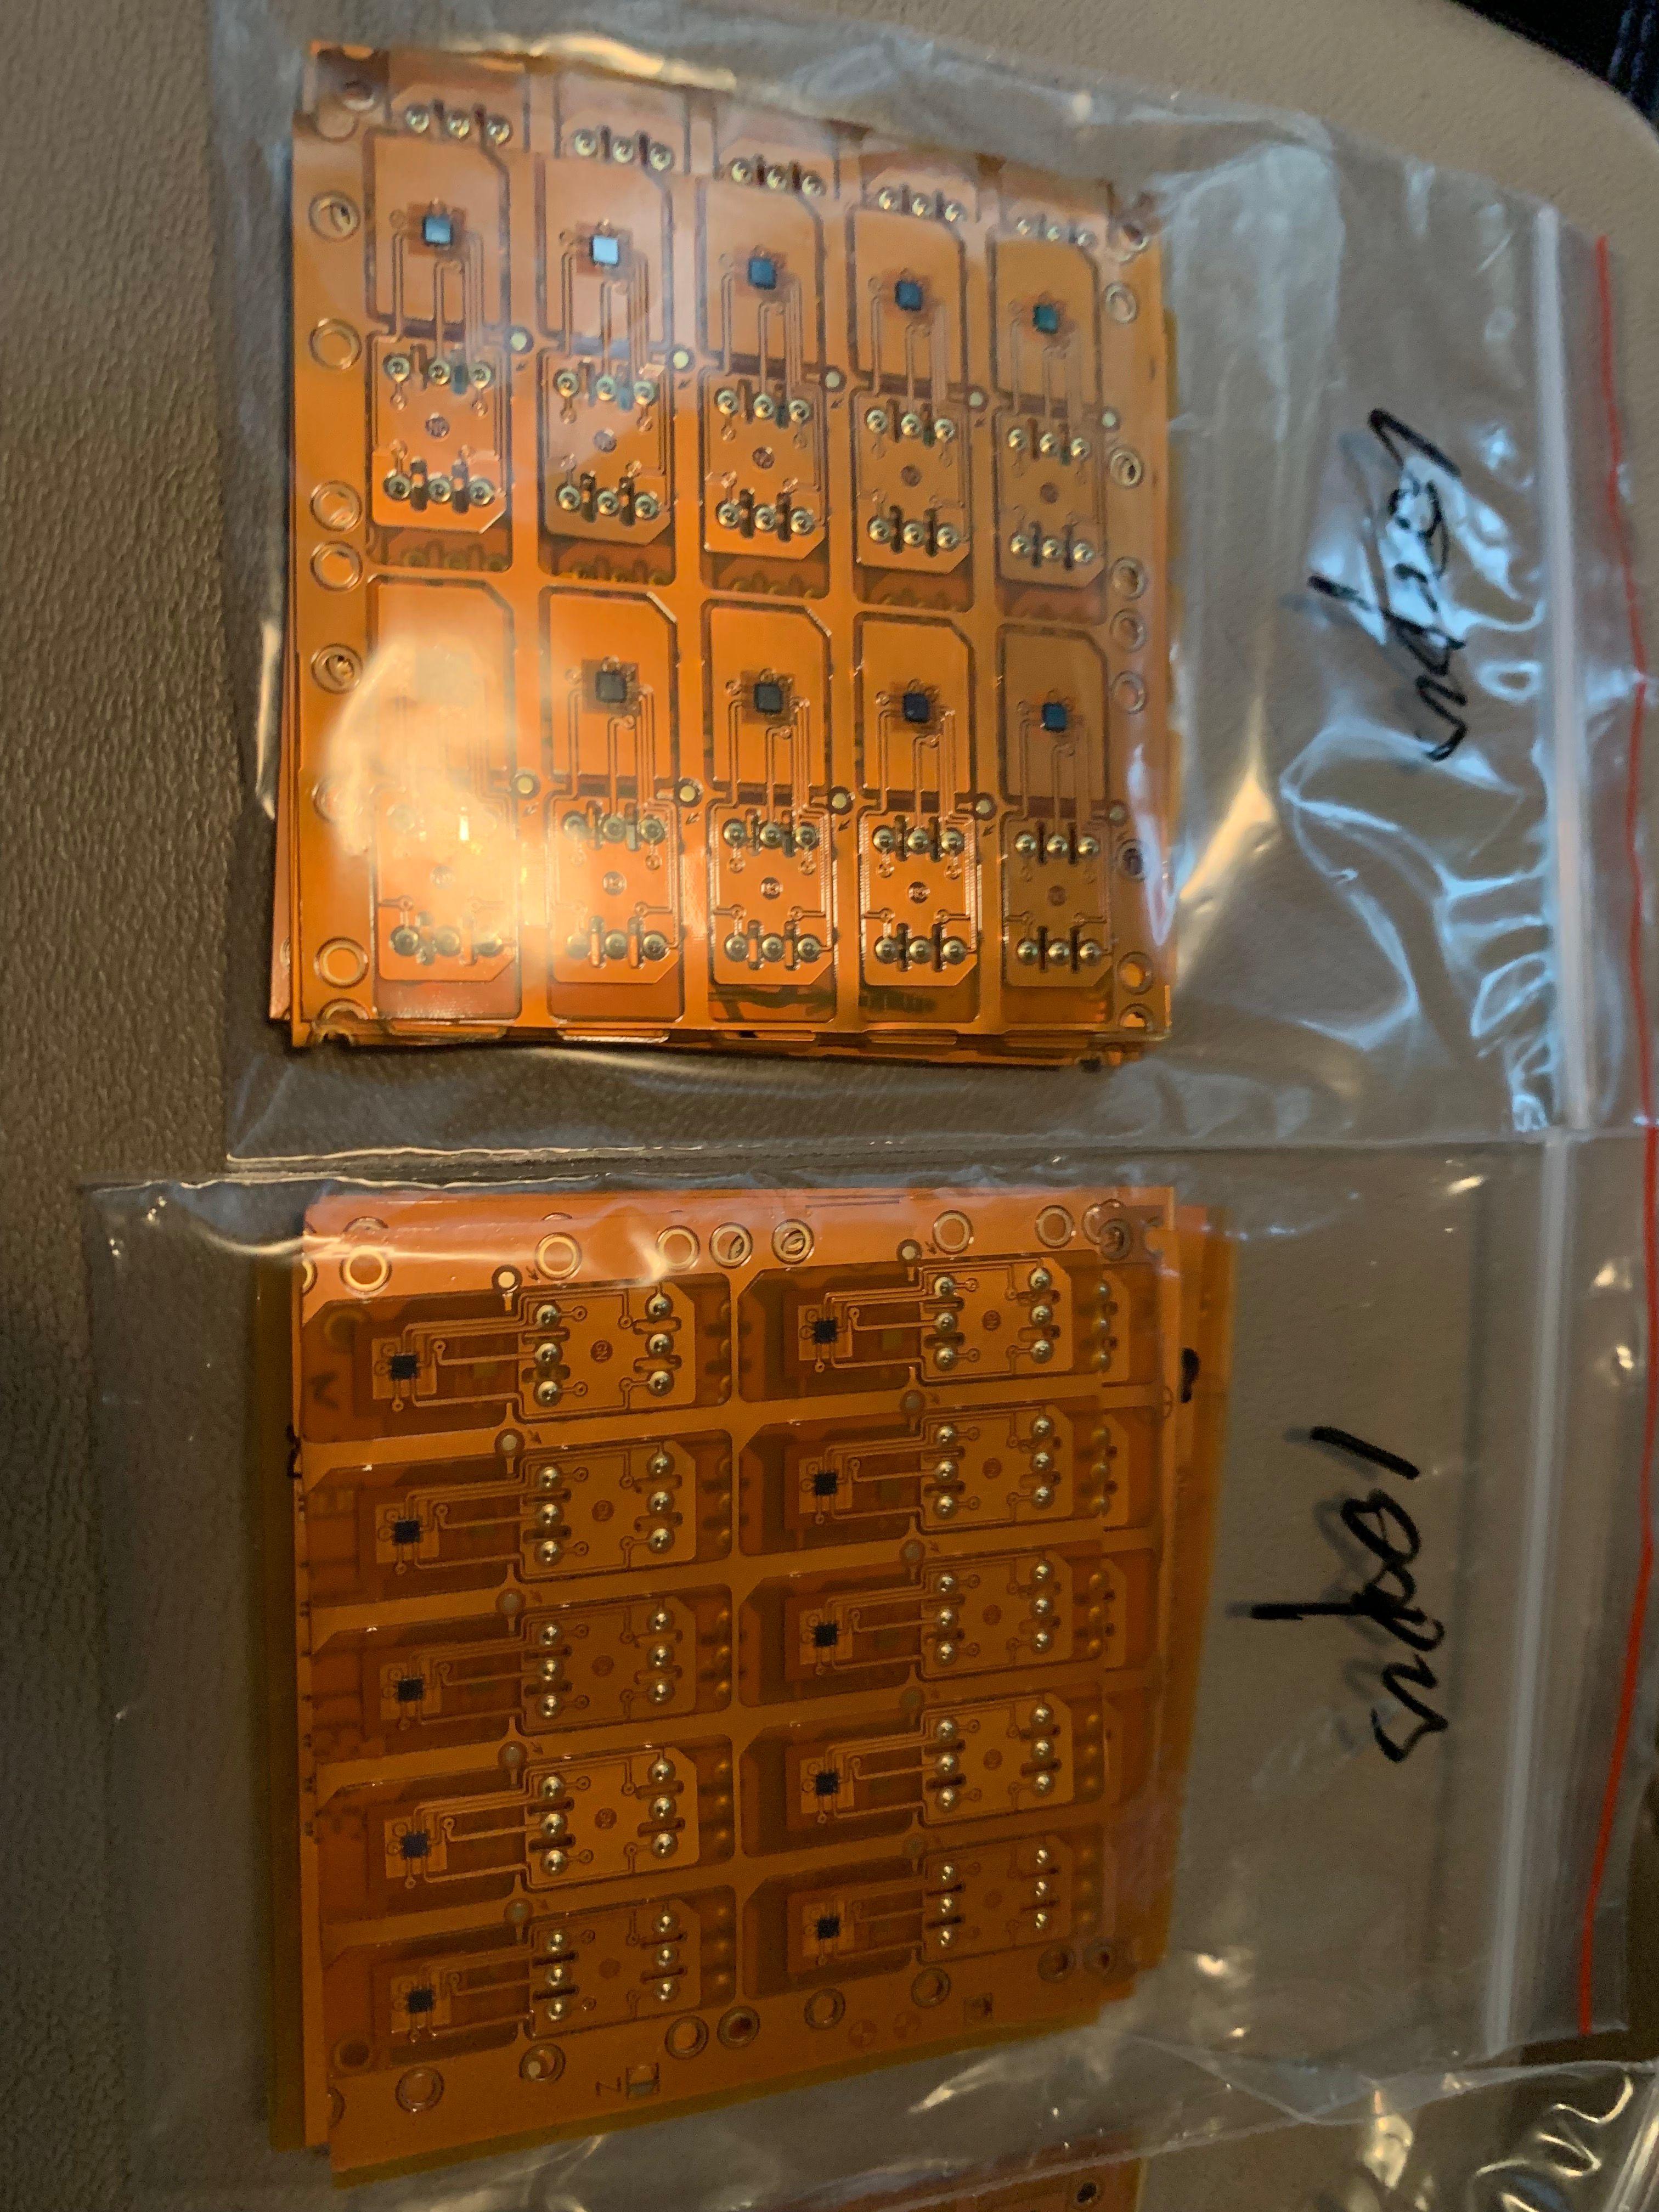 2019 MKSD perfect iccid Unlock Card for iPhone XR XS Max IOS 12 2 Sprint  verizon AU SB DOCOMO AT&T GEVEY ONESIM ios12 x